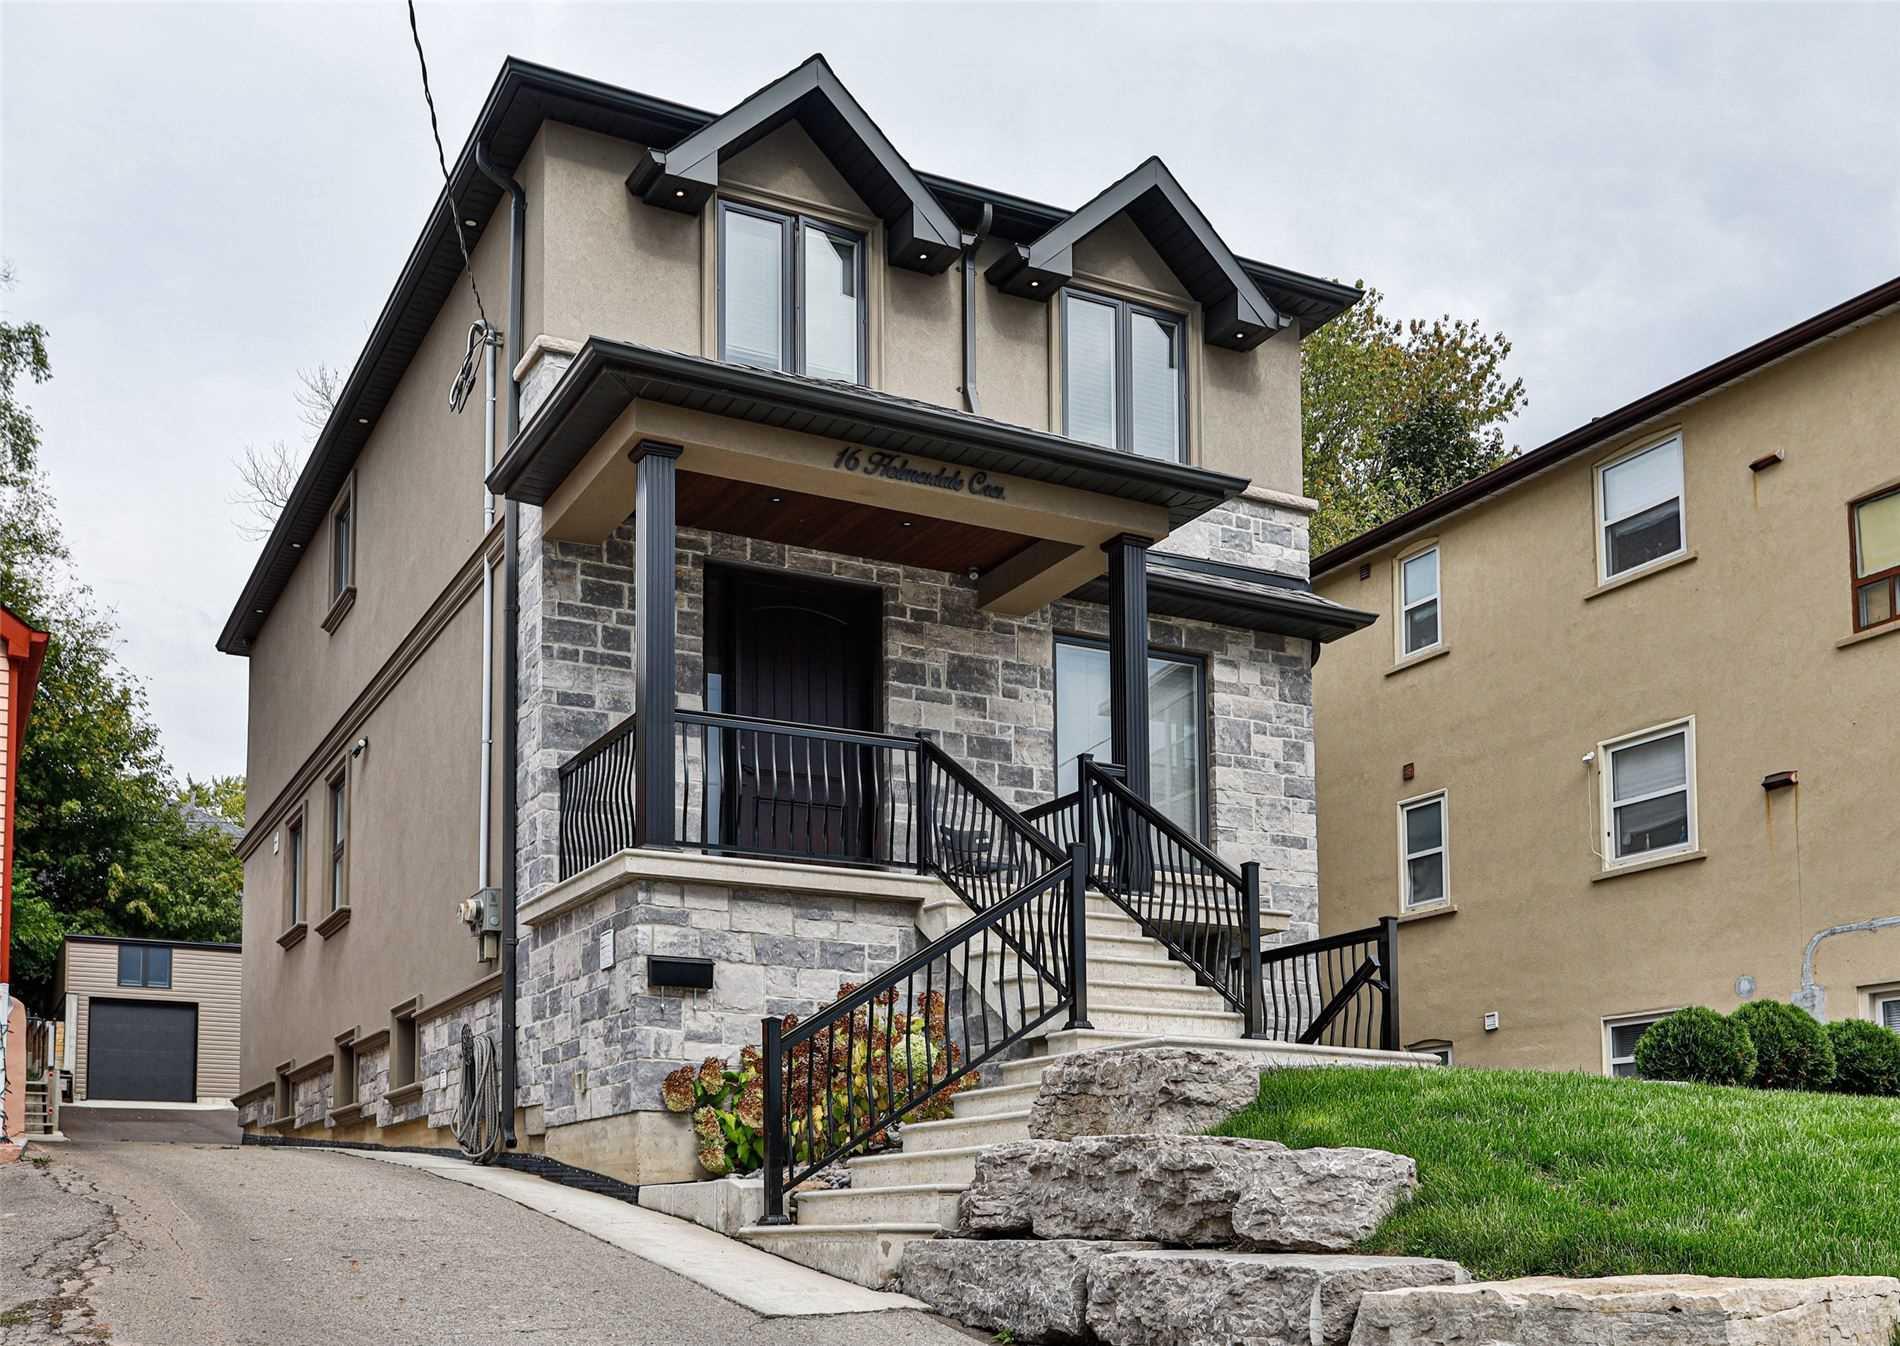 16 Holmesdale Cres, Toronto, Ontario M6E1Y5, 4 Bedrooms Bedrooms, 8 Rooms Rooms,4 BathroomsBathrooms,Detached,For Sale,Holmesdale,W5405060